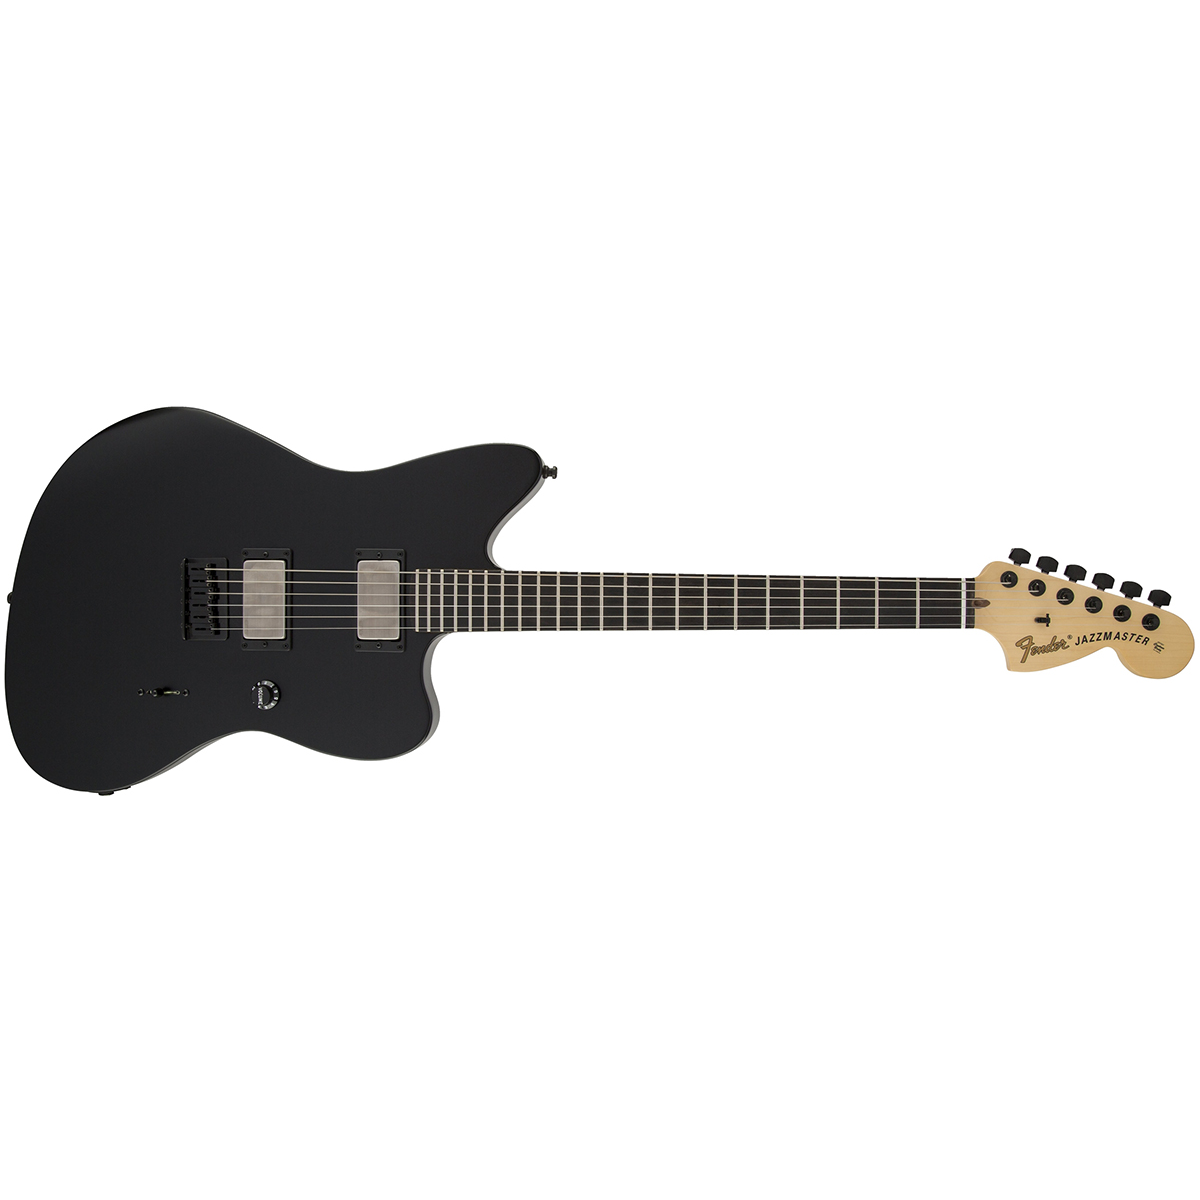 Fender Jim Root Jazzmaster Electric Guitar Satin Black